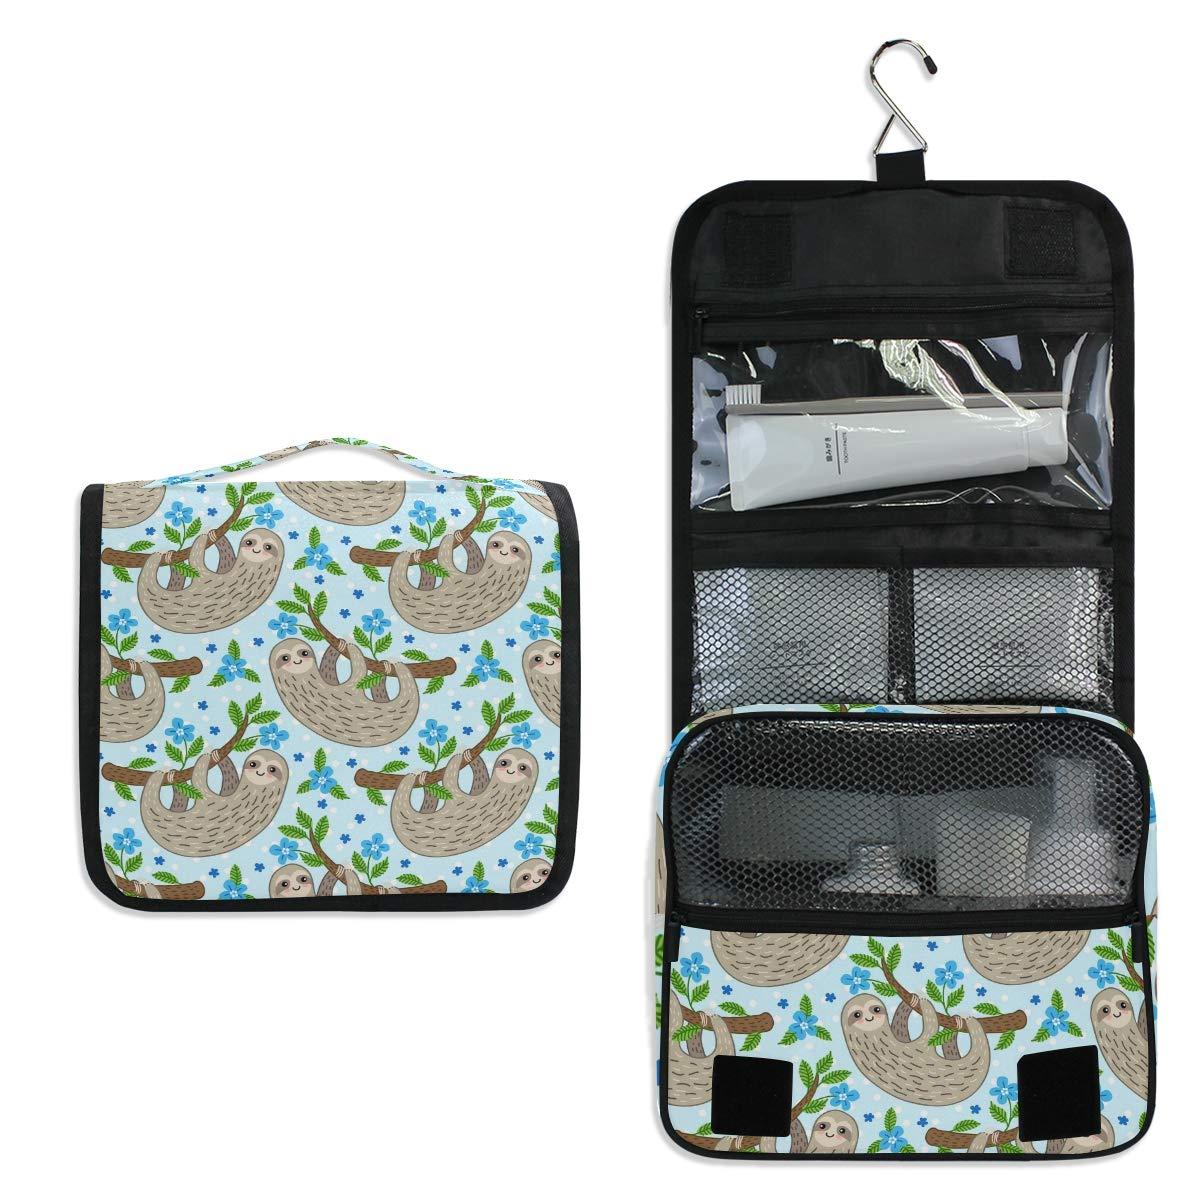 XMCL Hanging Toiletry Bag Animal Sloth Tree Pattern Portable Travel Cosmetic Makeup Organizer Wash Bag with Hanging Hook for Women Men